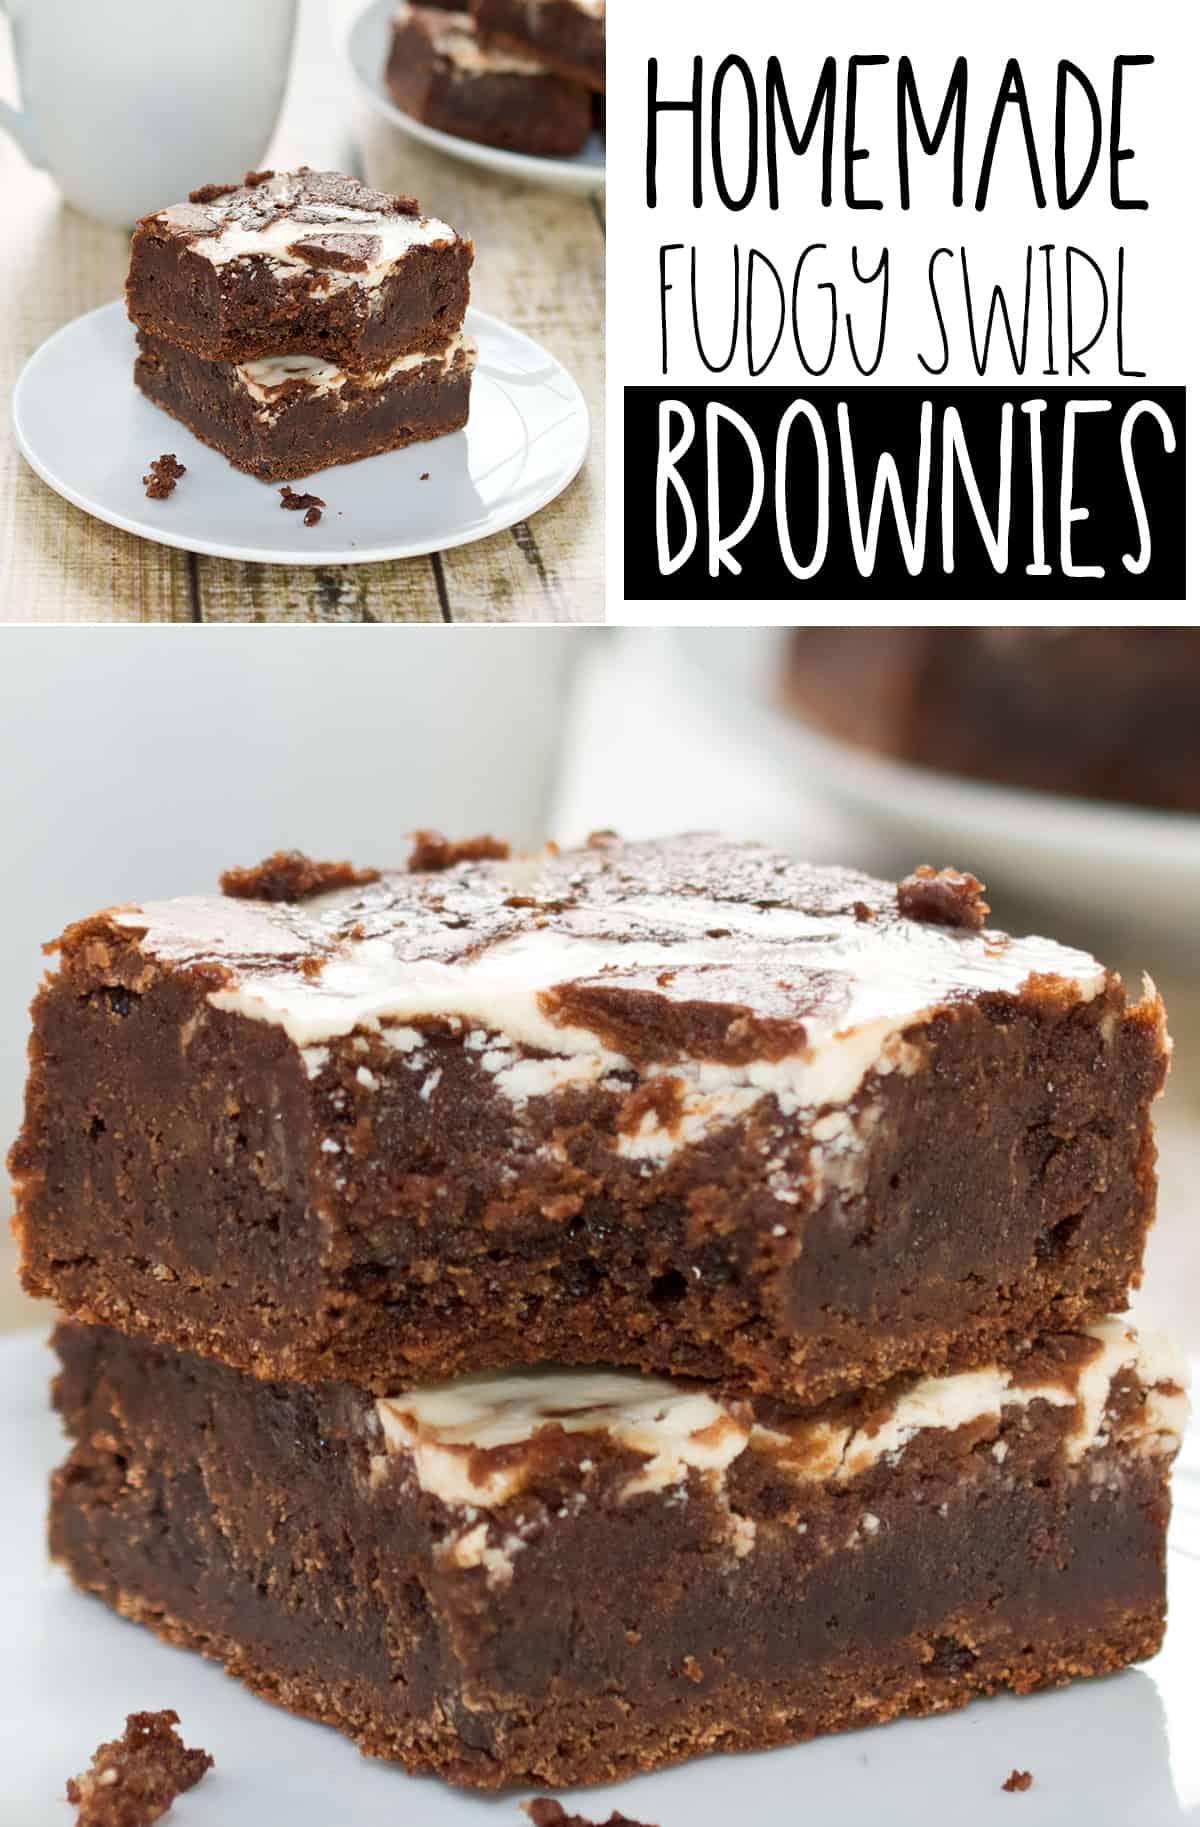 Easy Homemade Fudgy Swirl Brownies Recipe